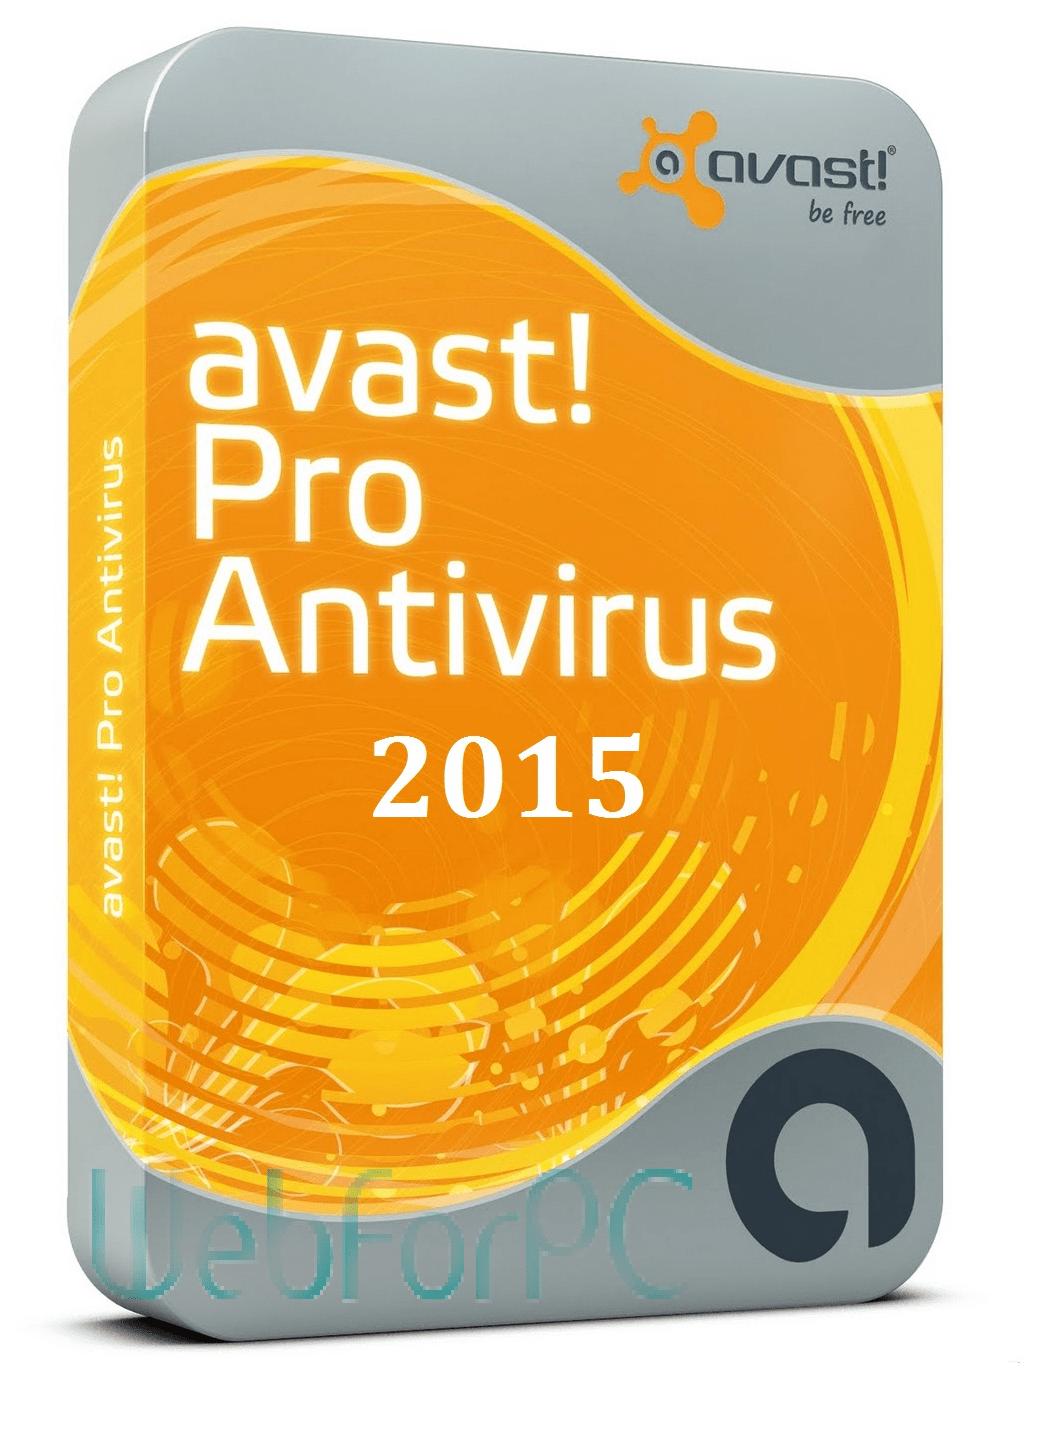 Avast Pro Antivirus 6 0 Full With Serial Key 100